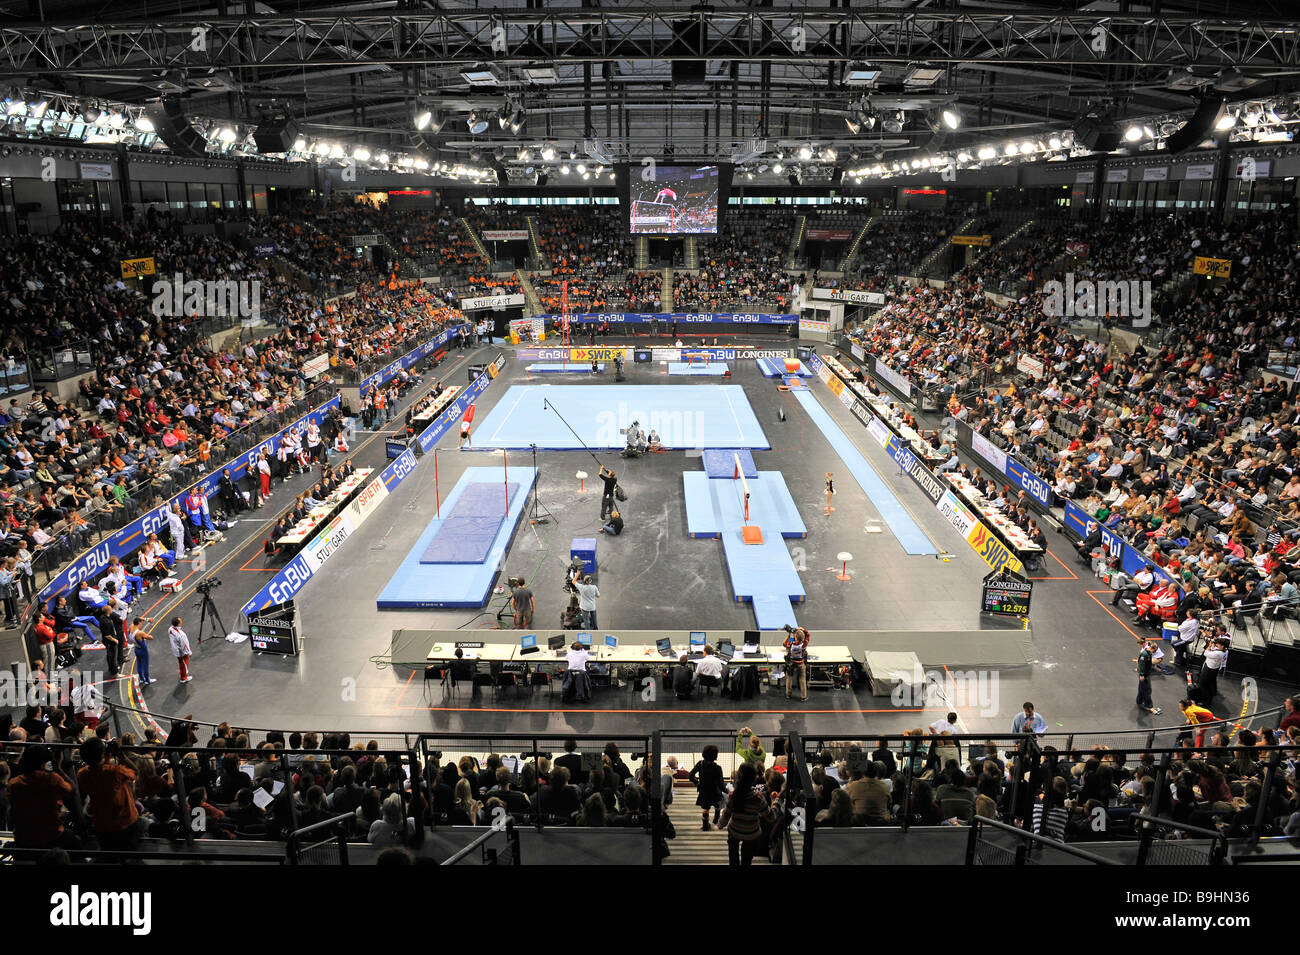 Porsche Arena, interior, gymnastics world cup Stuttgart 2008, Baden-Wuerttemberg, Germany, Europe - Stock Image